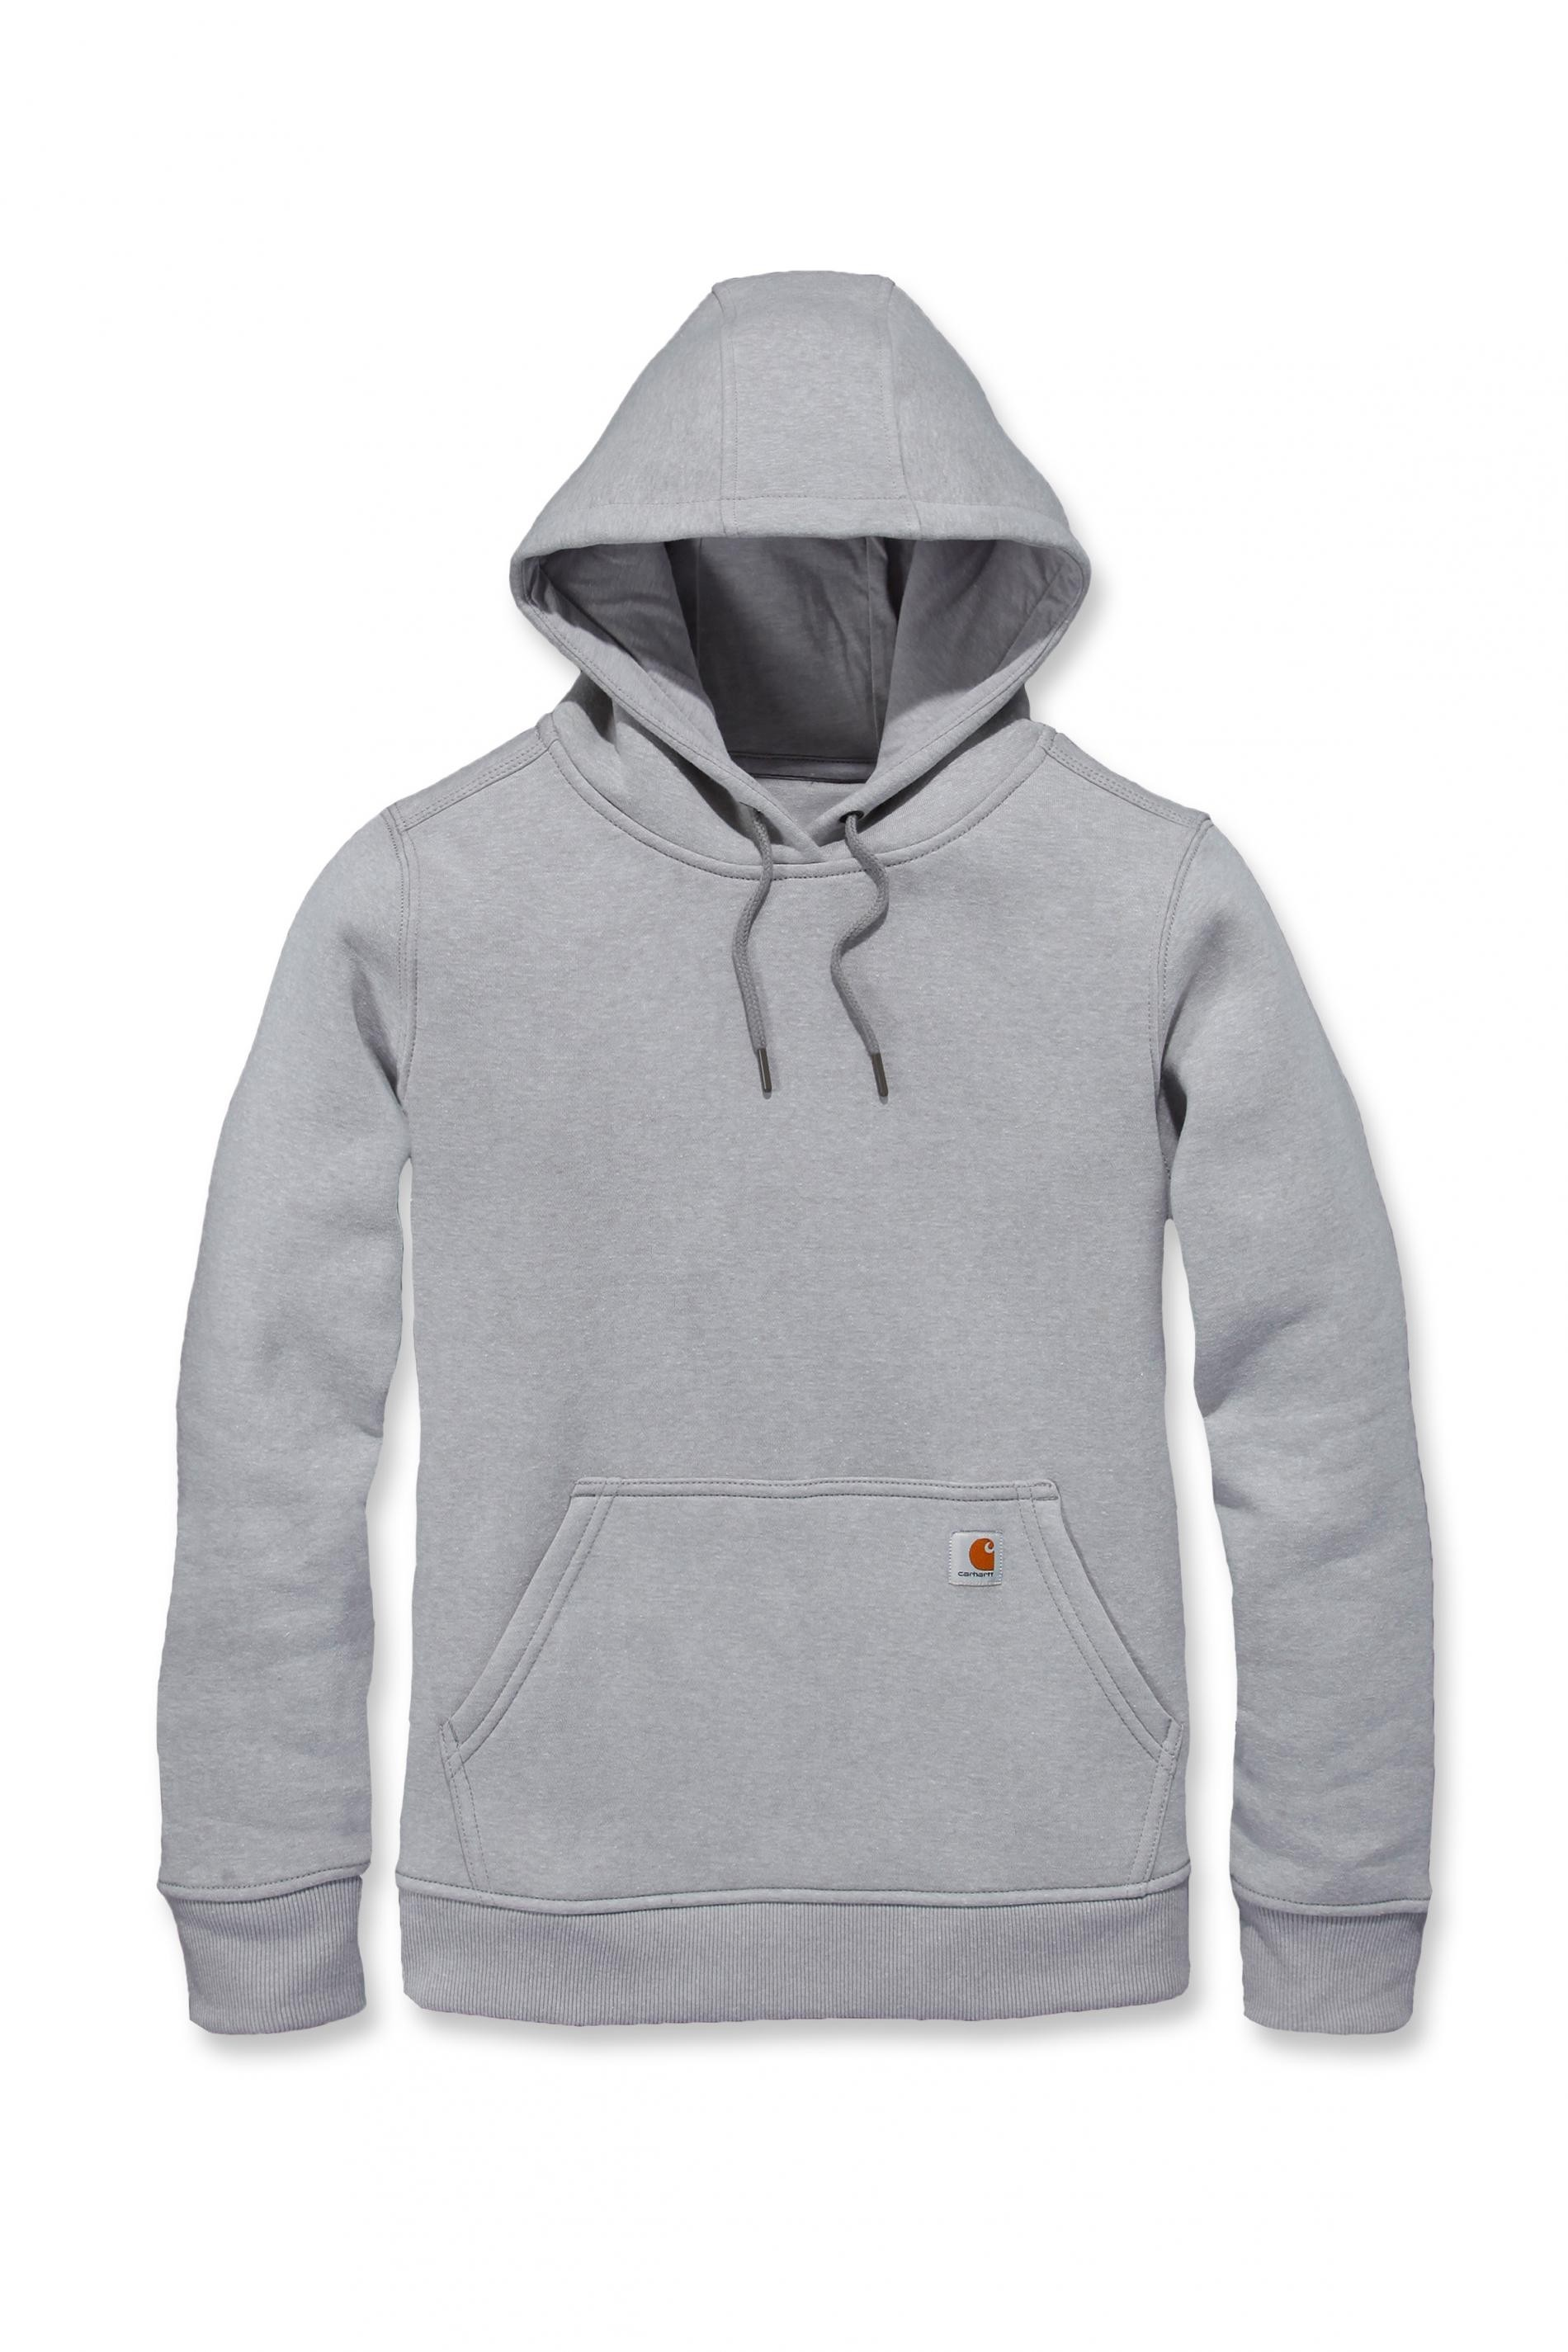 Carhartt Womens Pullover Sweatshirt Hoody : Asphalt Heather